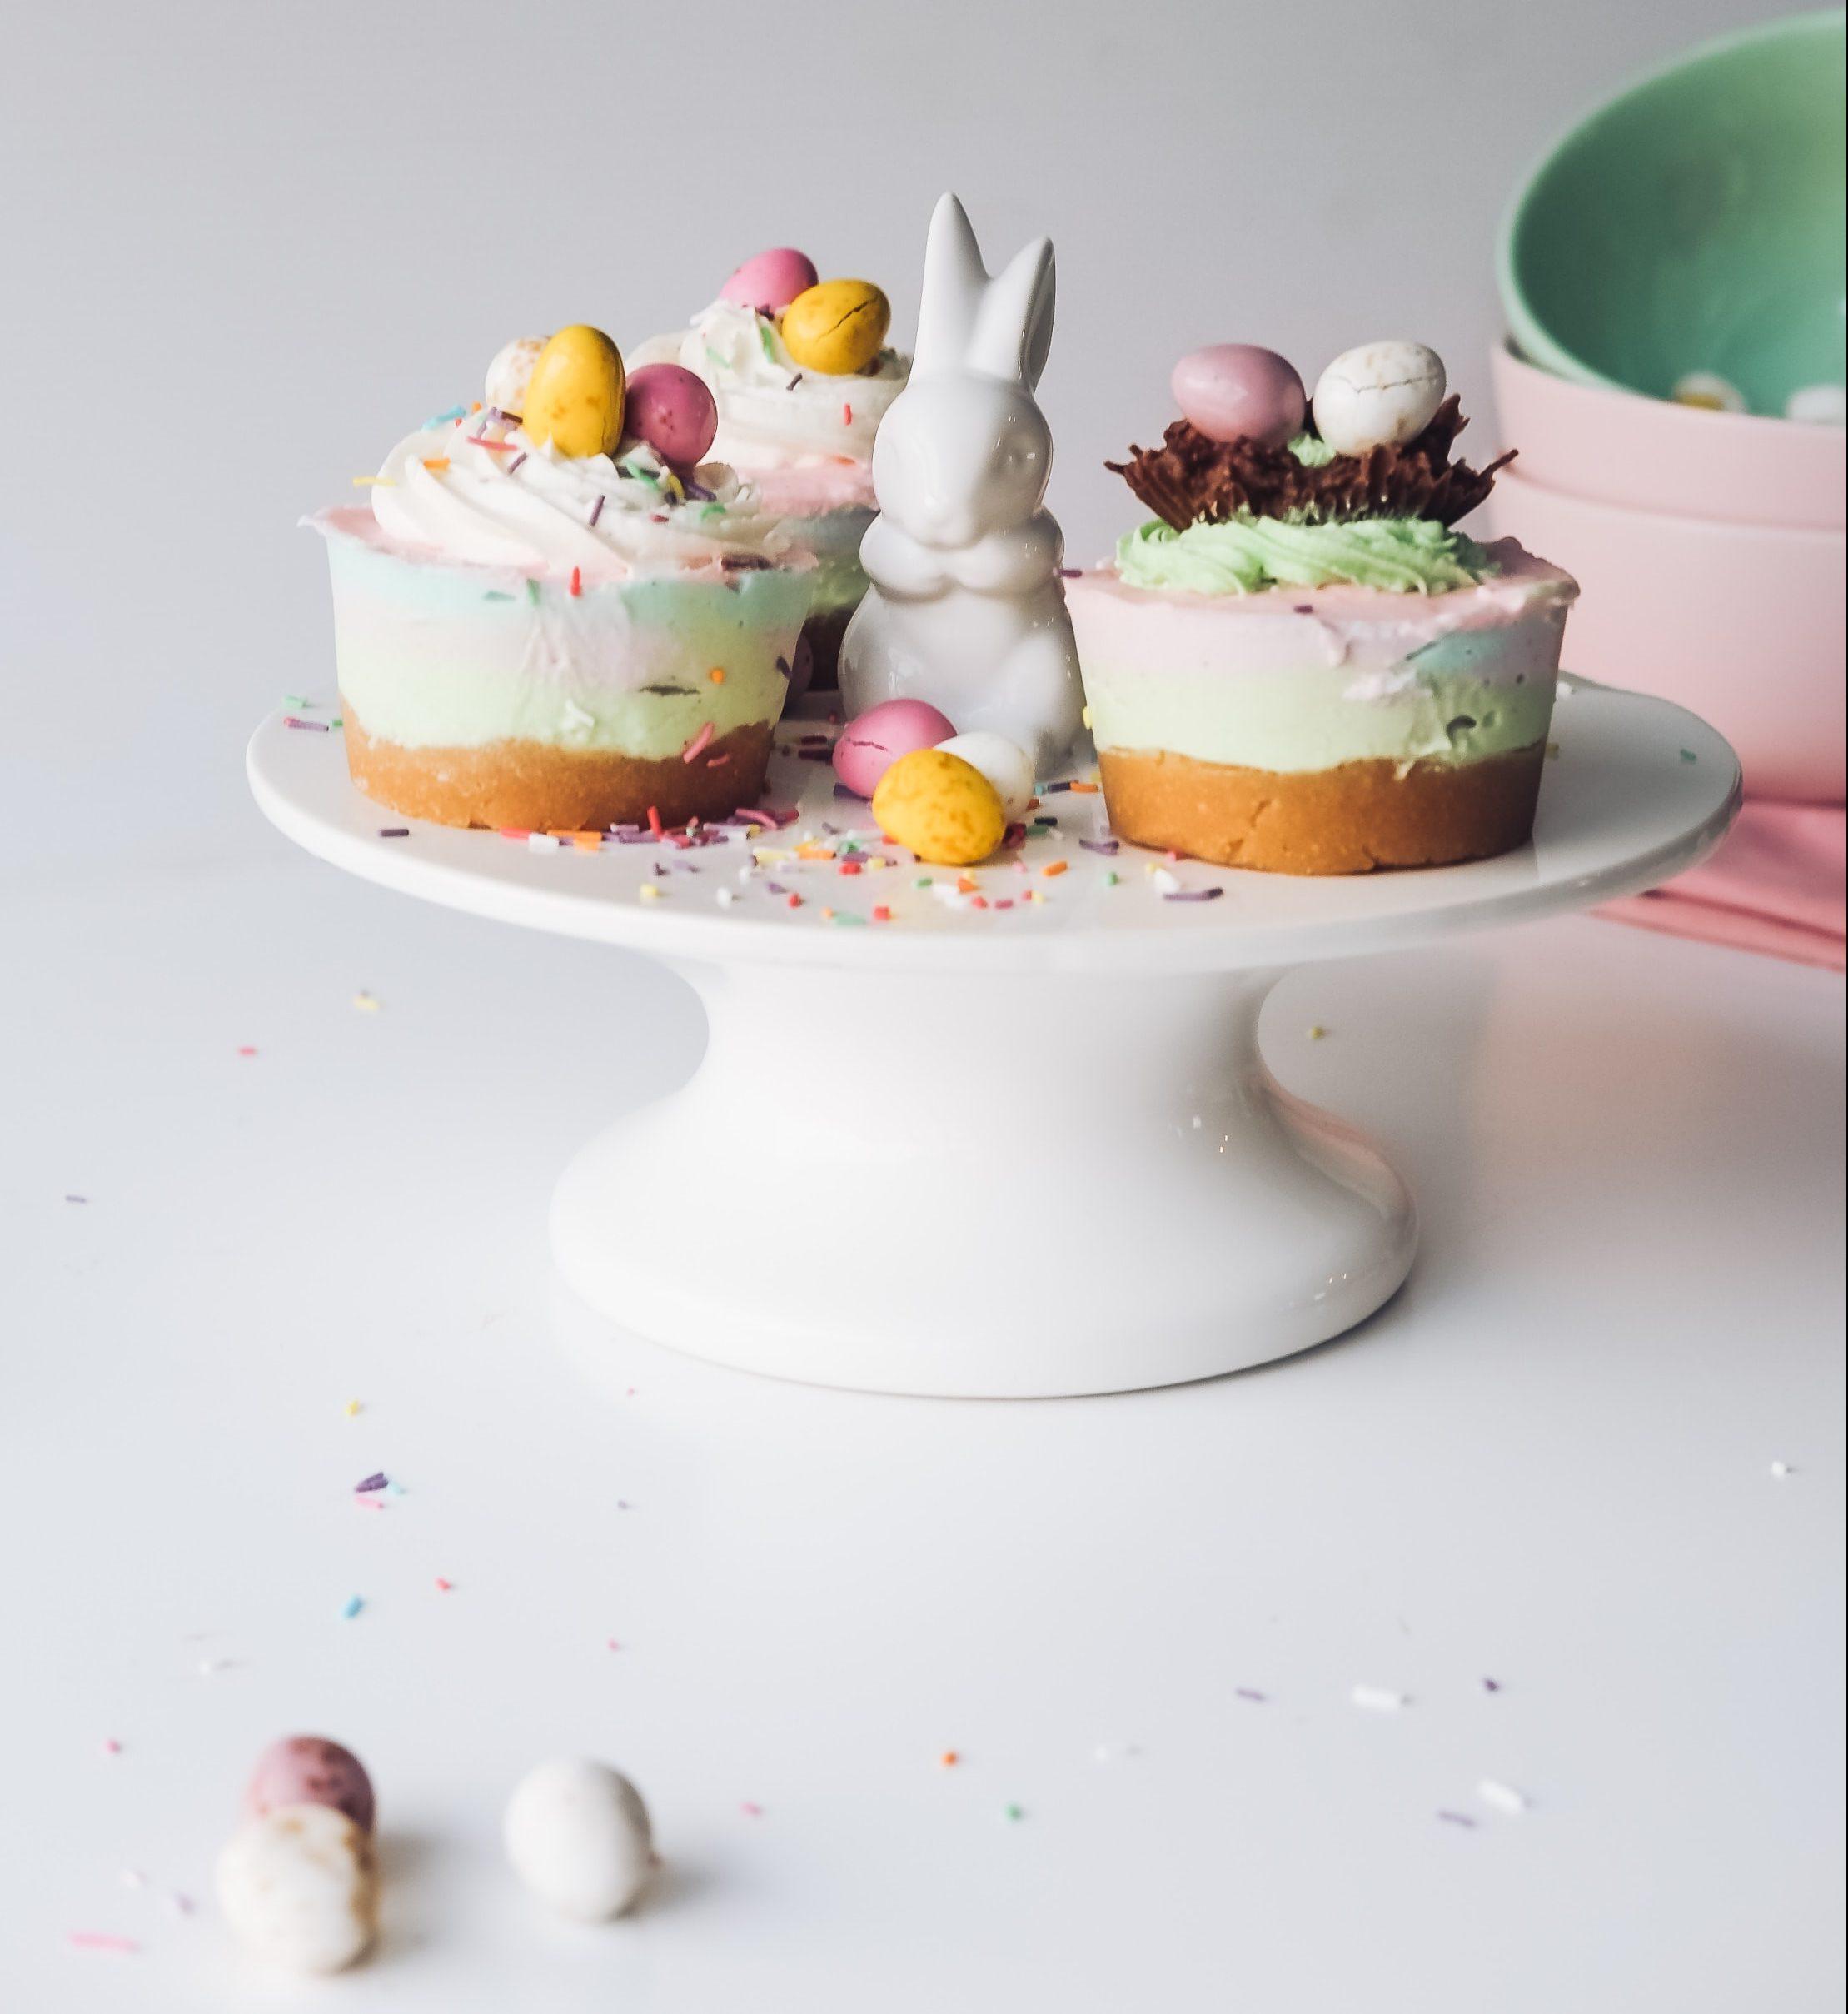 Easter Baking Recipes using Tea